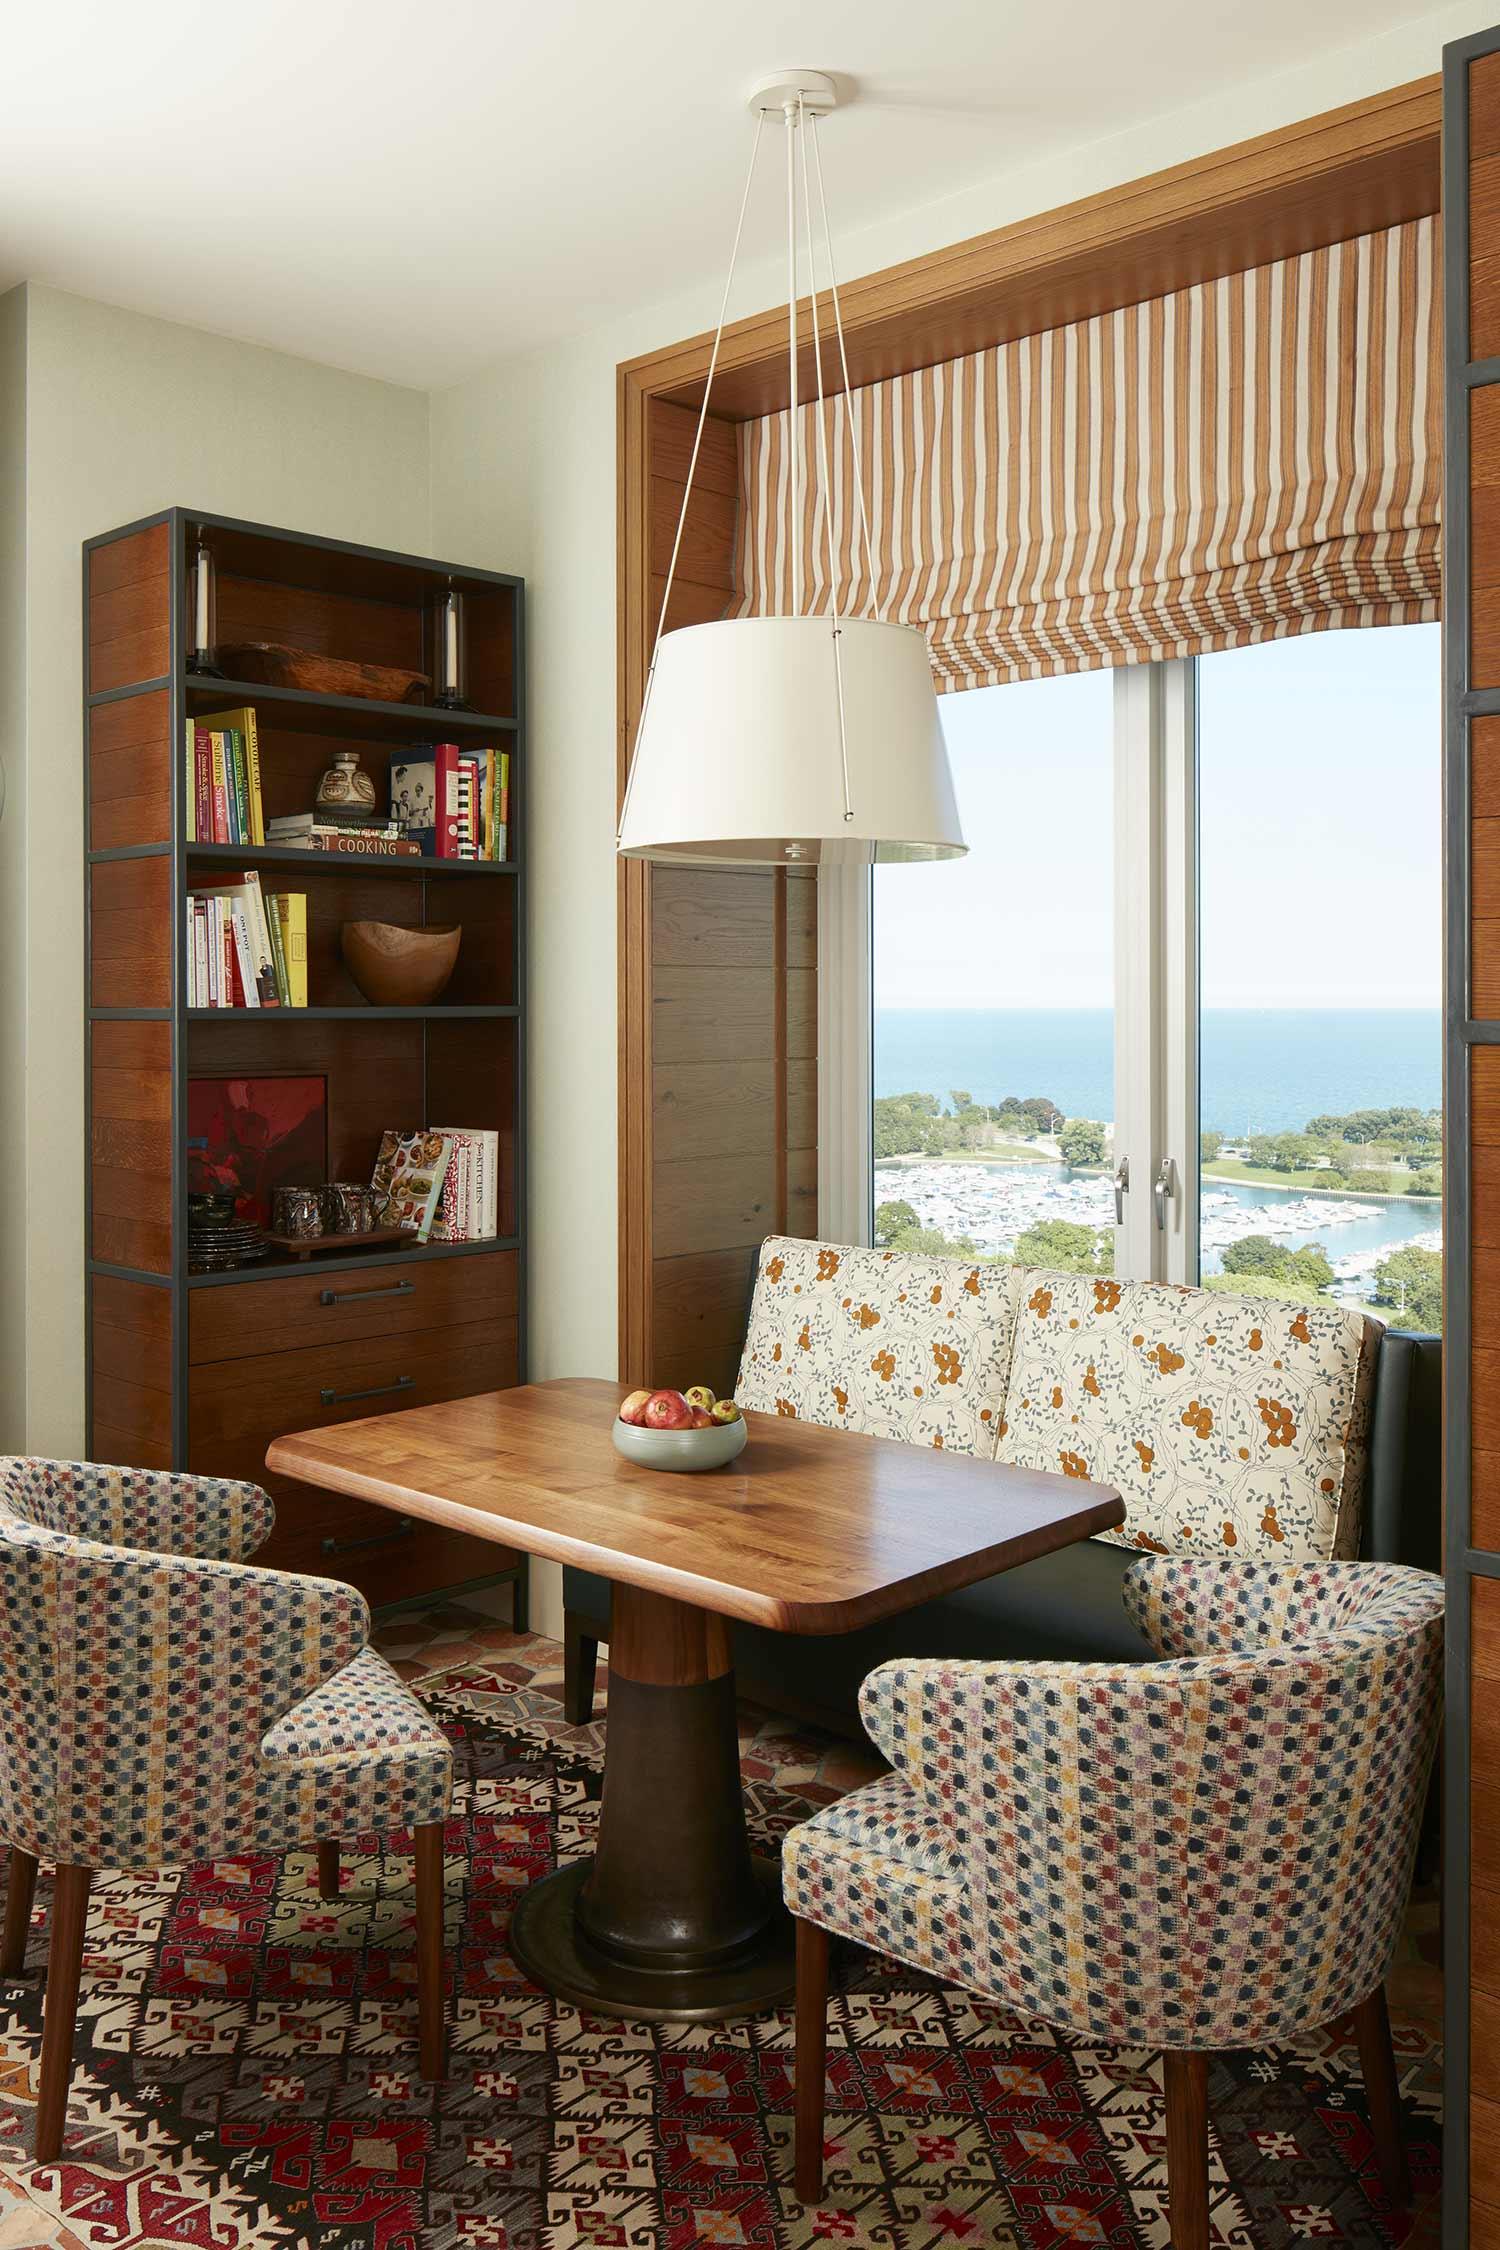 custom banquette & flat roman shade Interior Design: Bruce Fox, Inc.